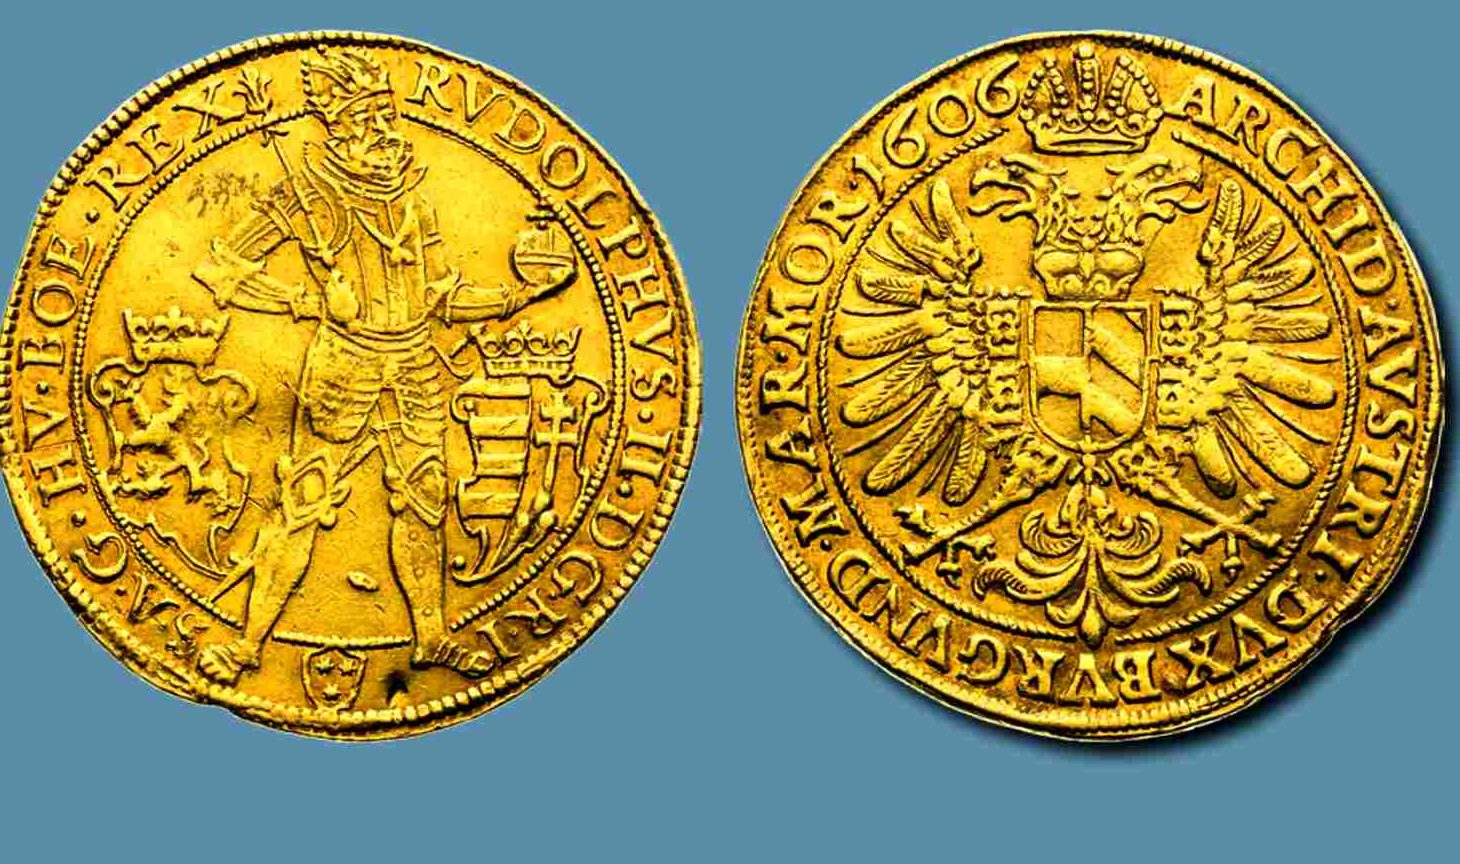 Pětidukát Rudolfa II.